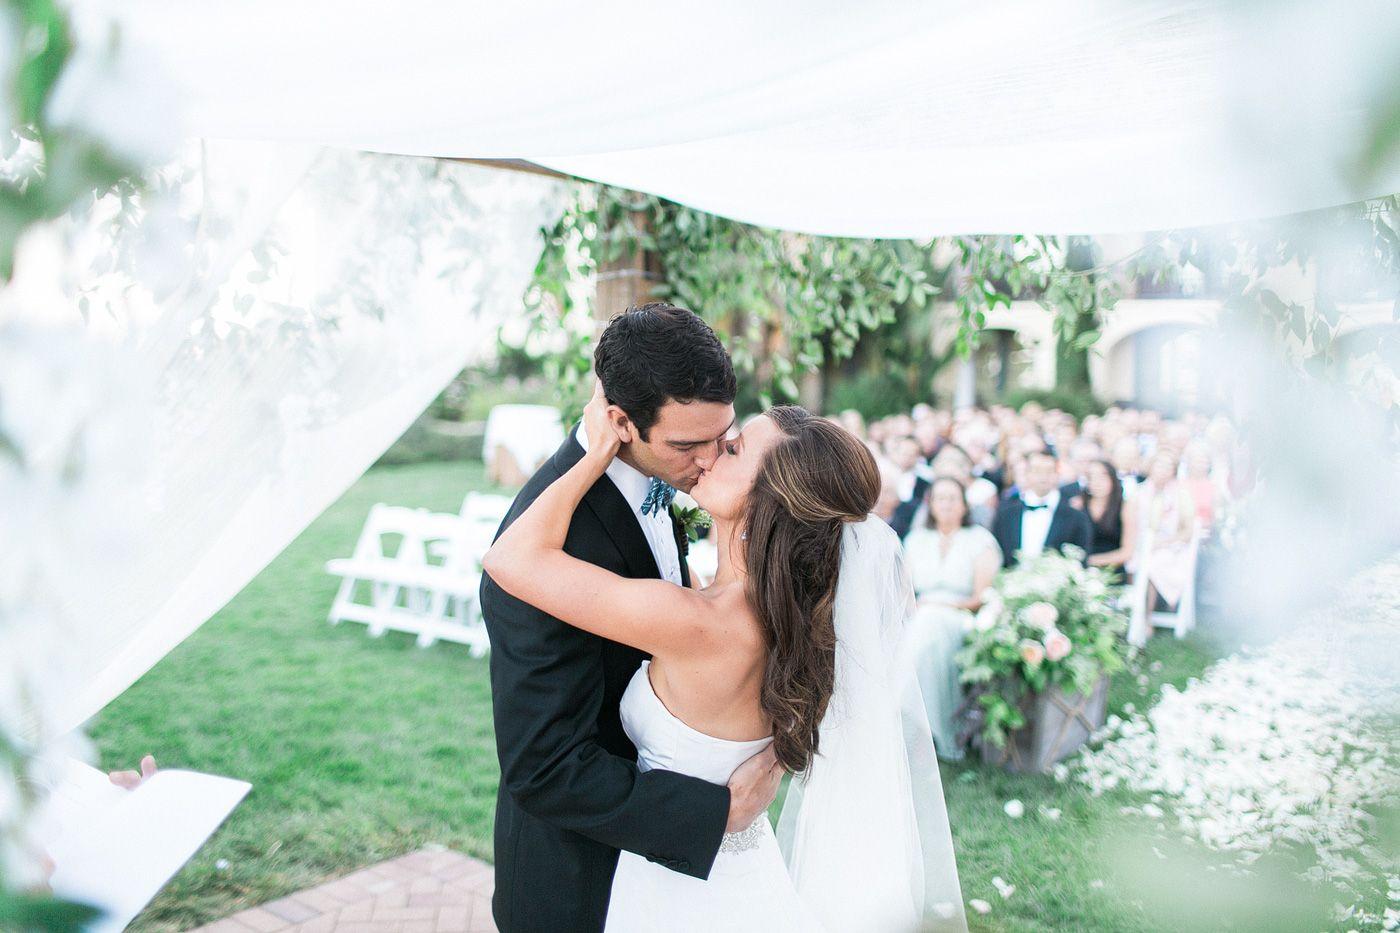 First Kiss! Terranea wedding, Terranea resort wedding